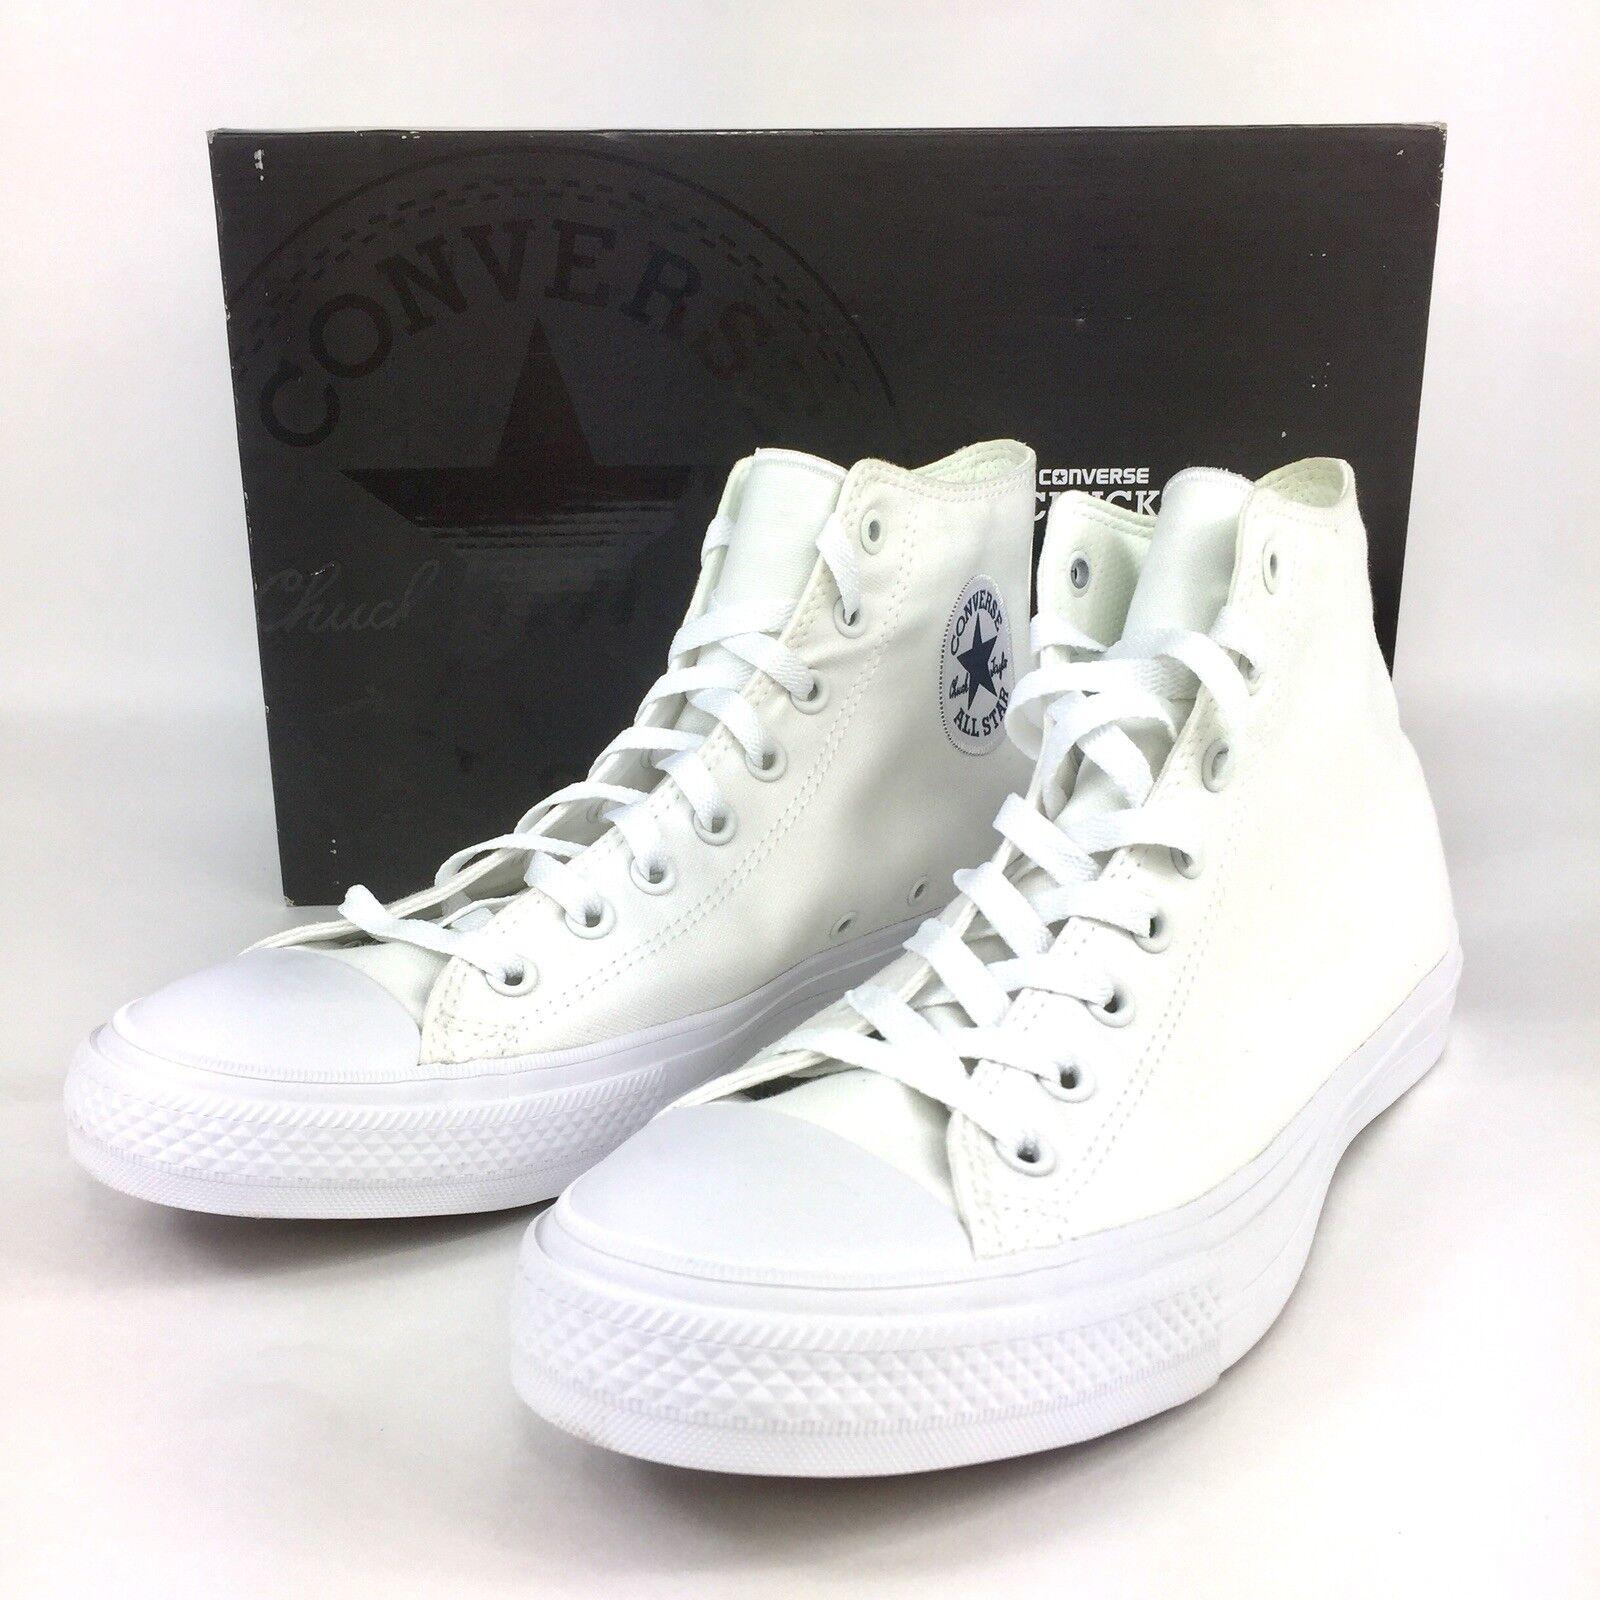 Converse White Chuck Taylor All Star II High Triple White Converse 150148C Taglia 11 d8ca08